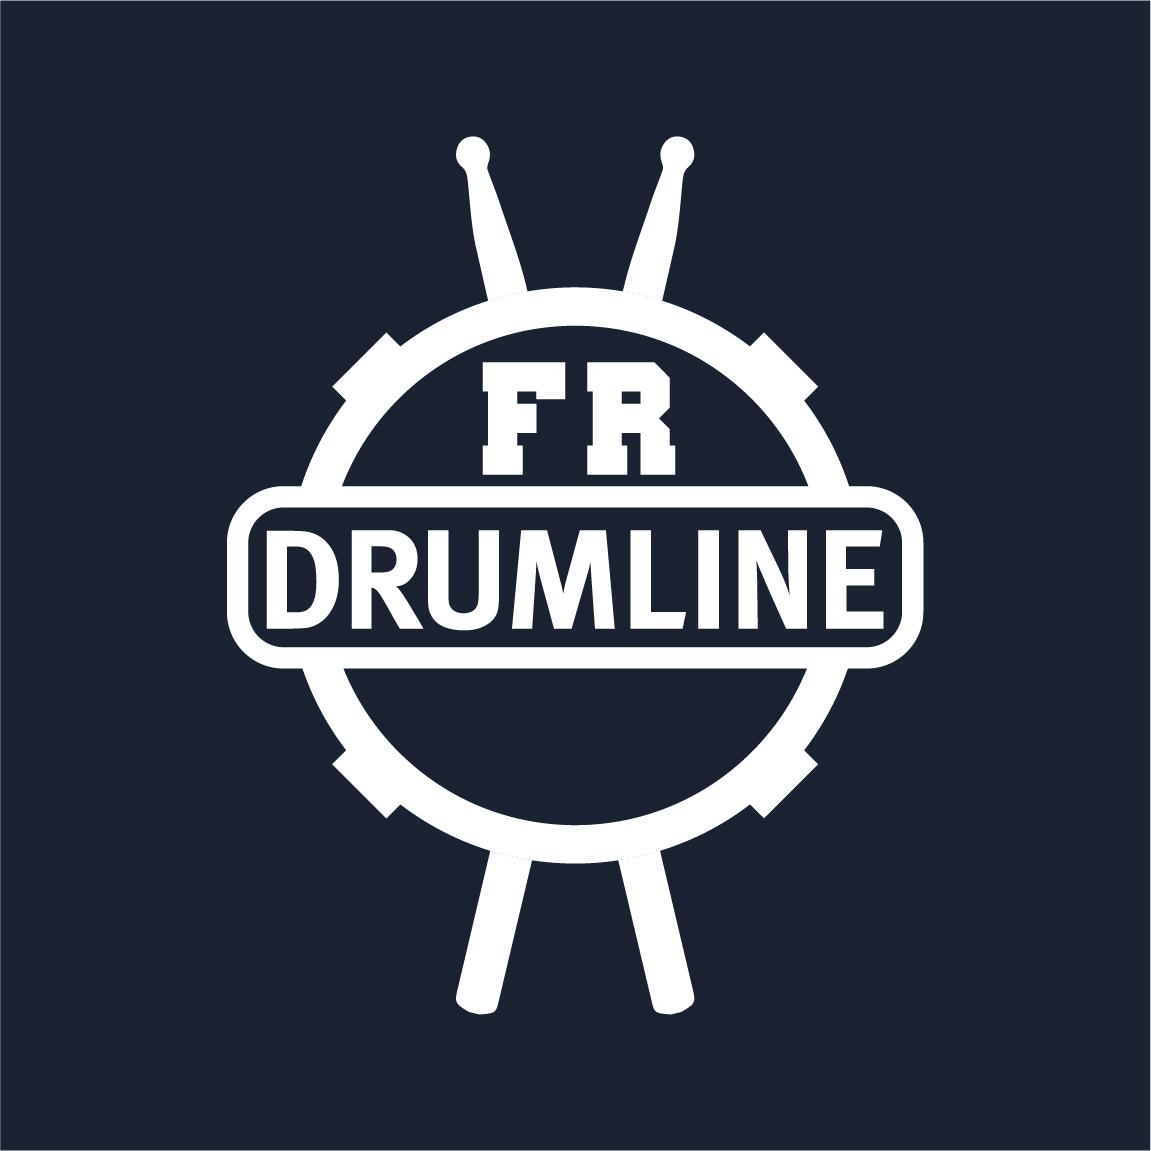 FR Drumline